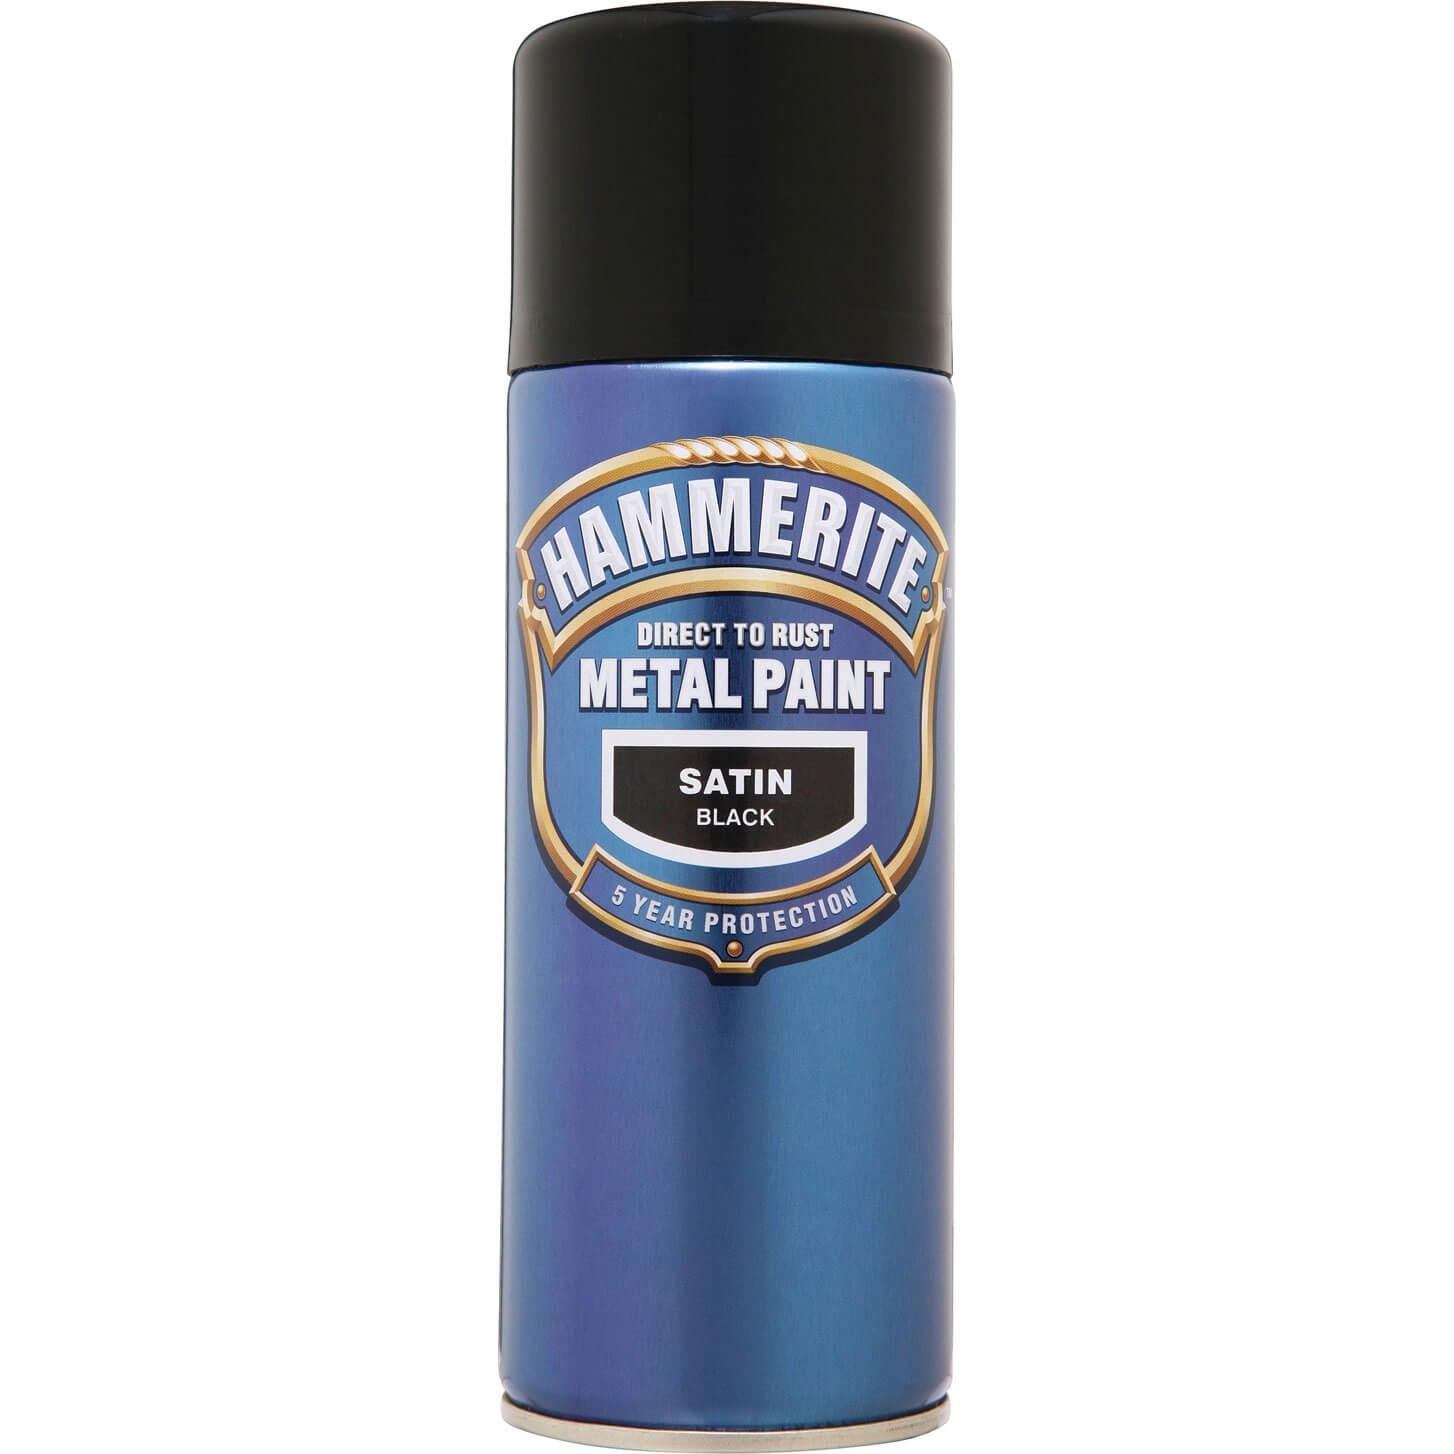 Image of Hammerite Smooth Finish Aerosol Metal Paint Satin Black 400ml